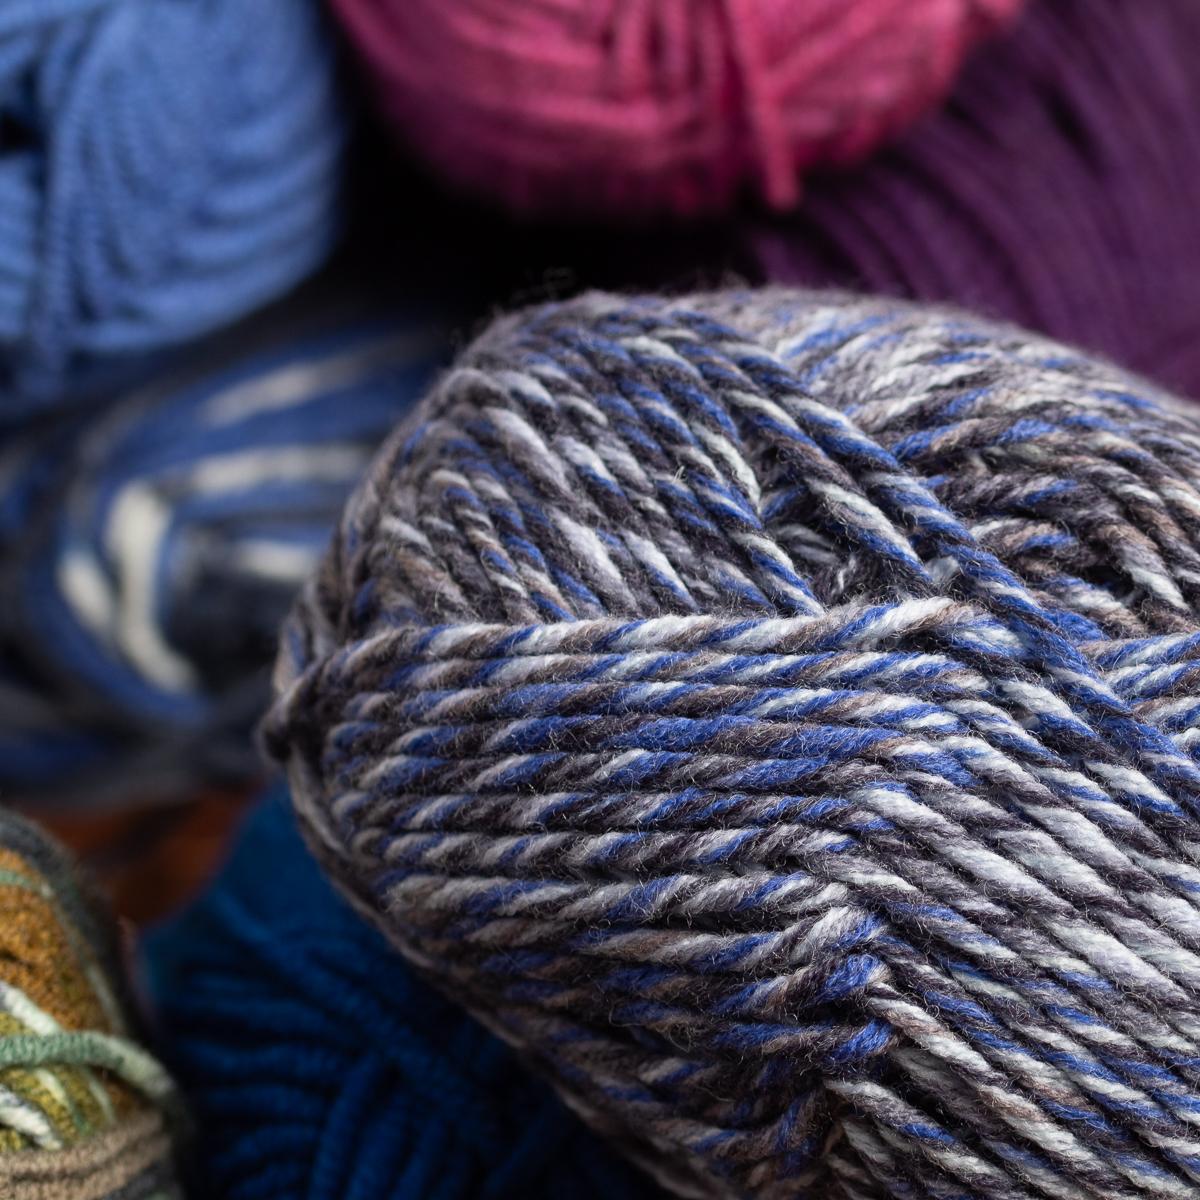 3pk-Lion-Brand-Woolspun-Acrylic-amp-Wool-Yarn-Bulky-5-Knit-Crocheting-Skeins-Soft thumbnail 98